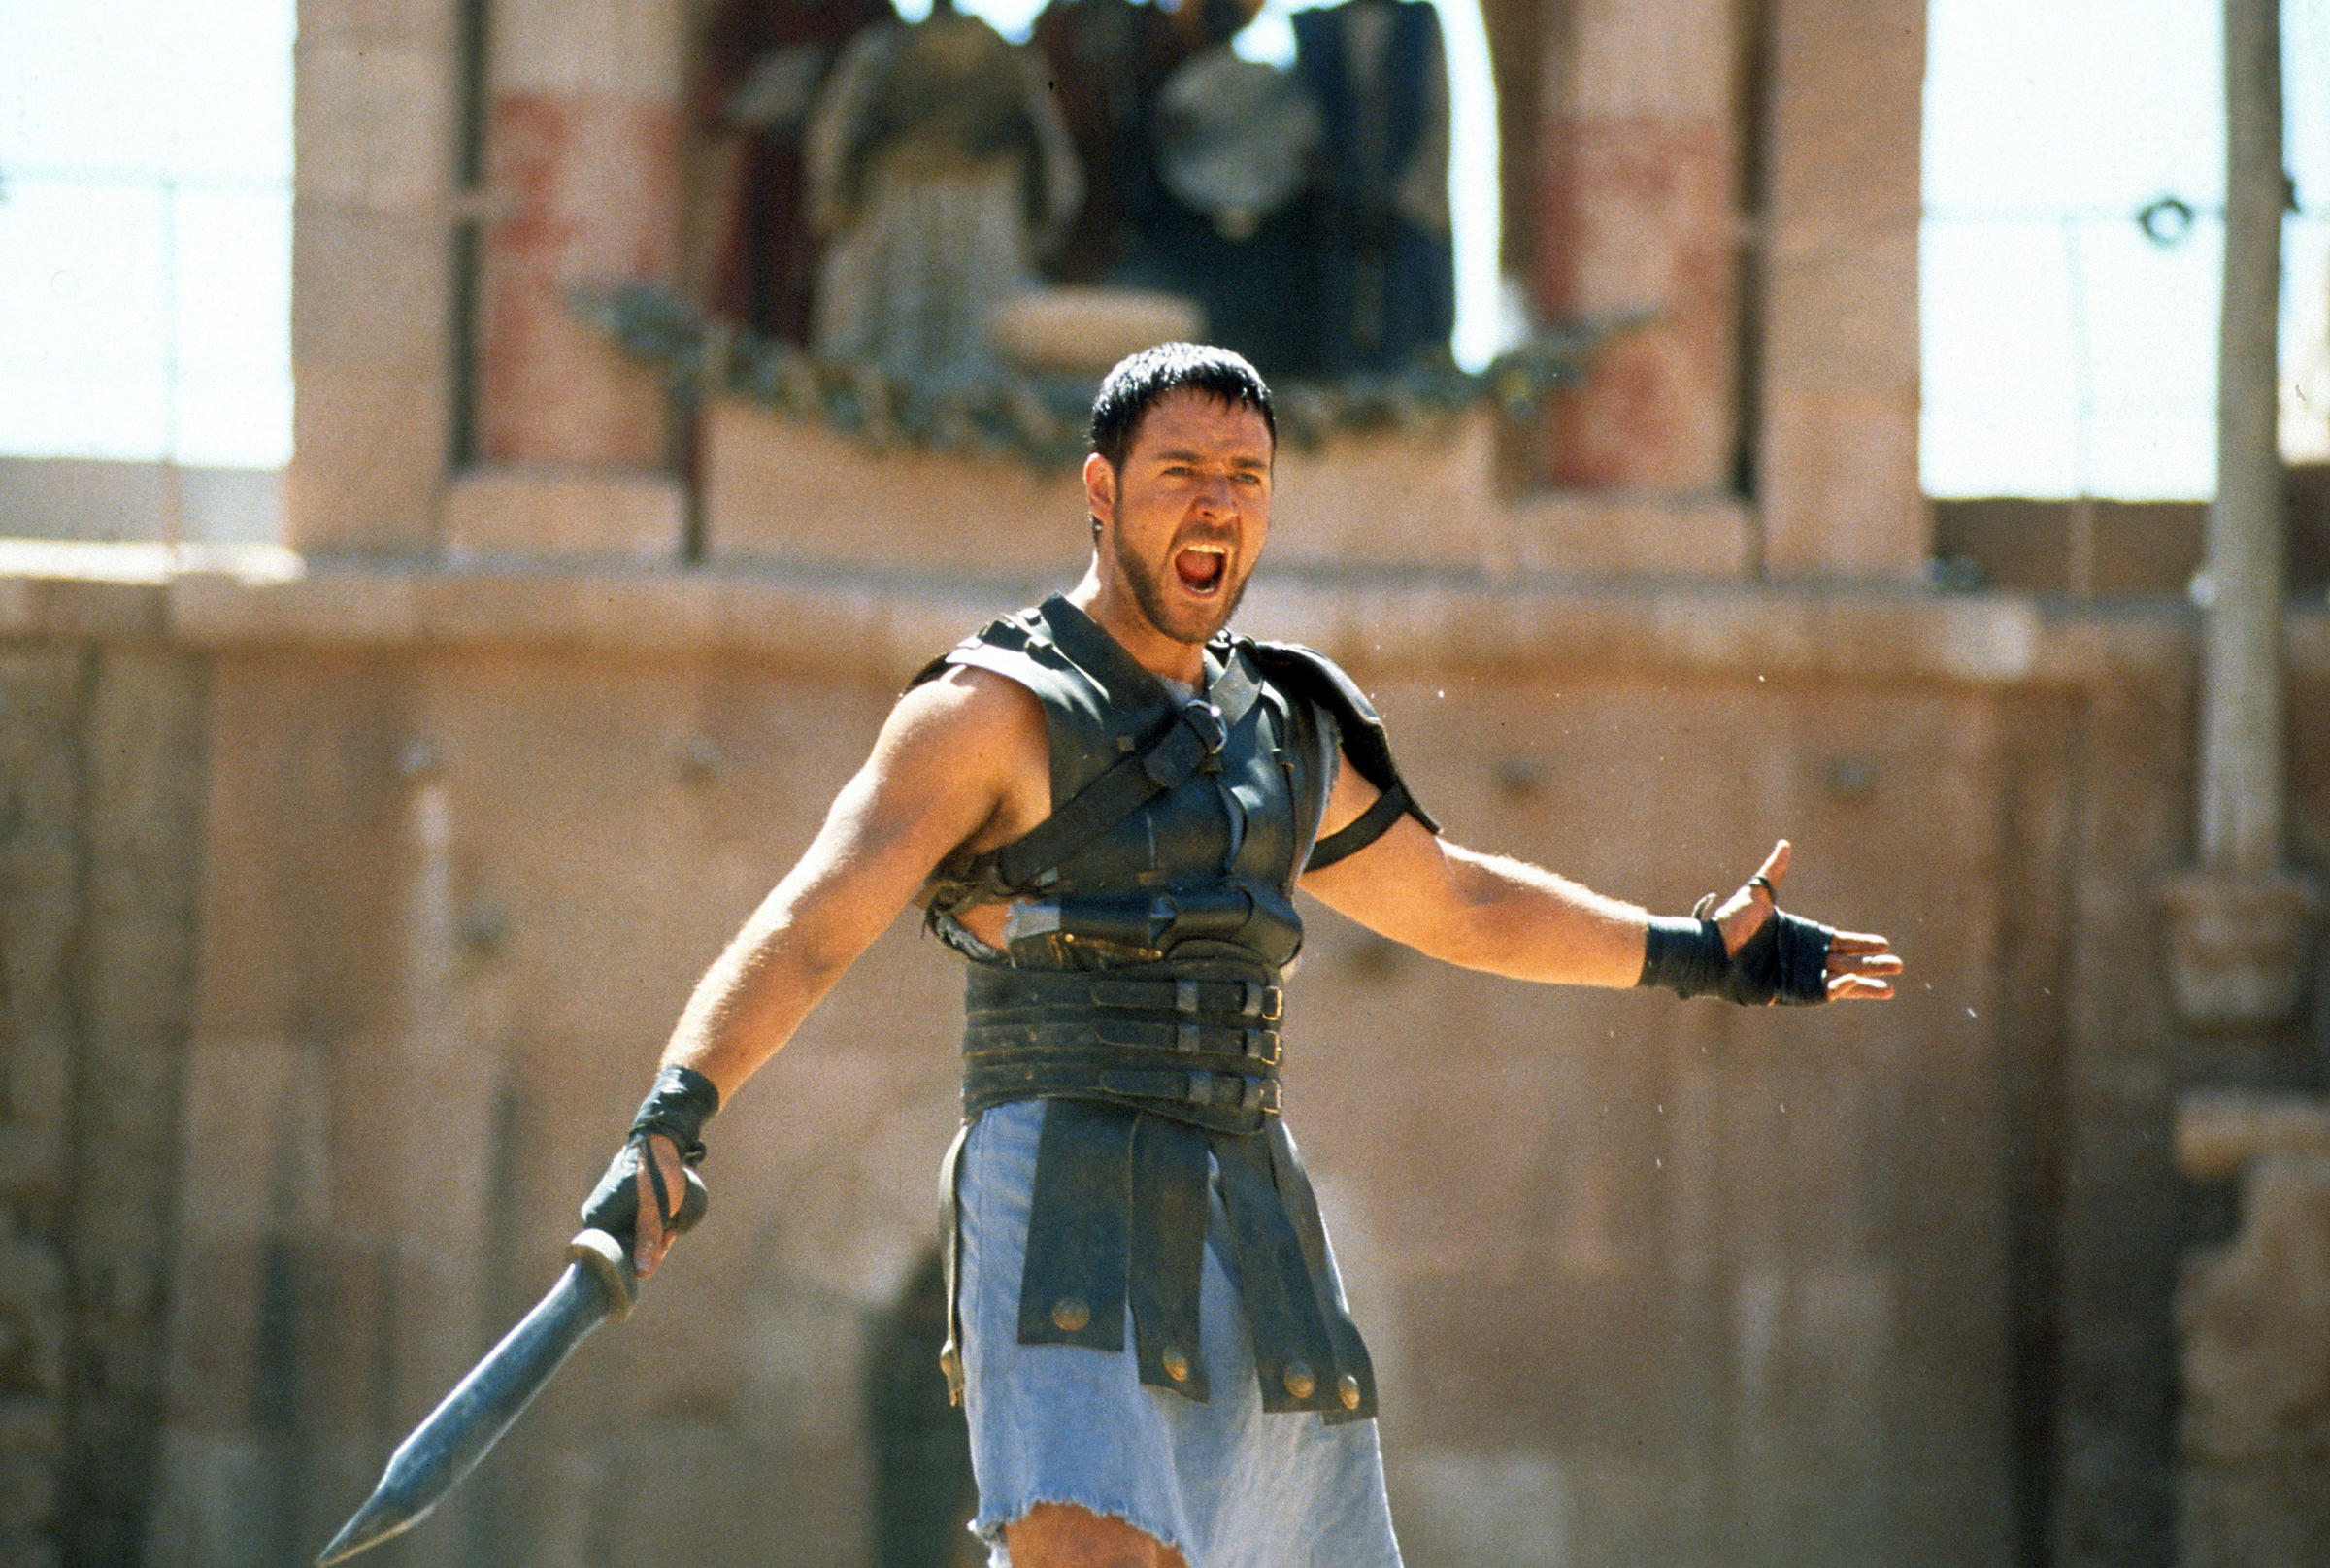 Matchmaking gladiátor 3